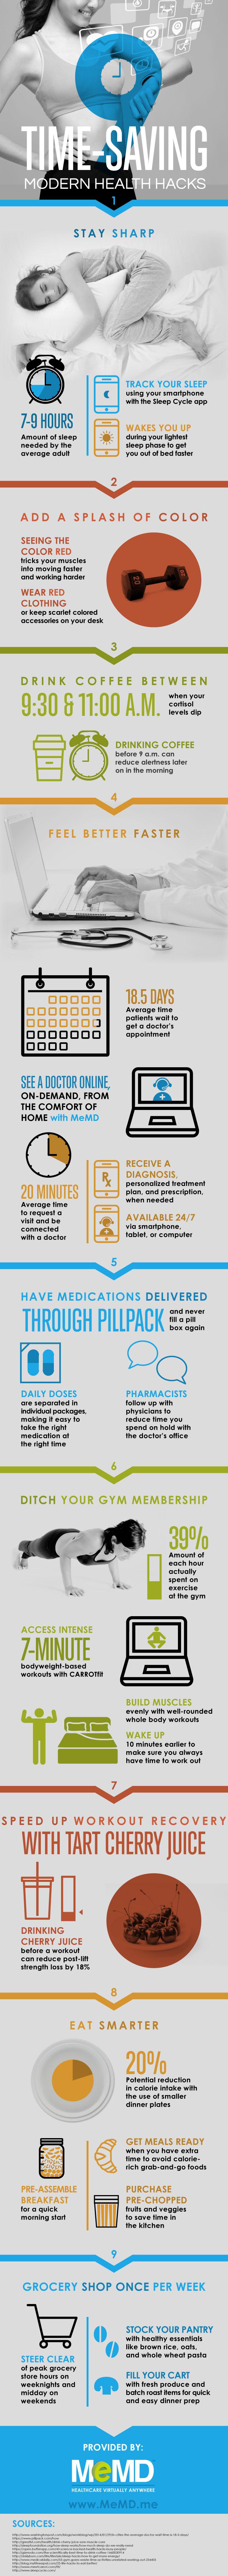 infographic-memd-health-life-hacks